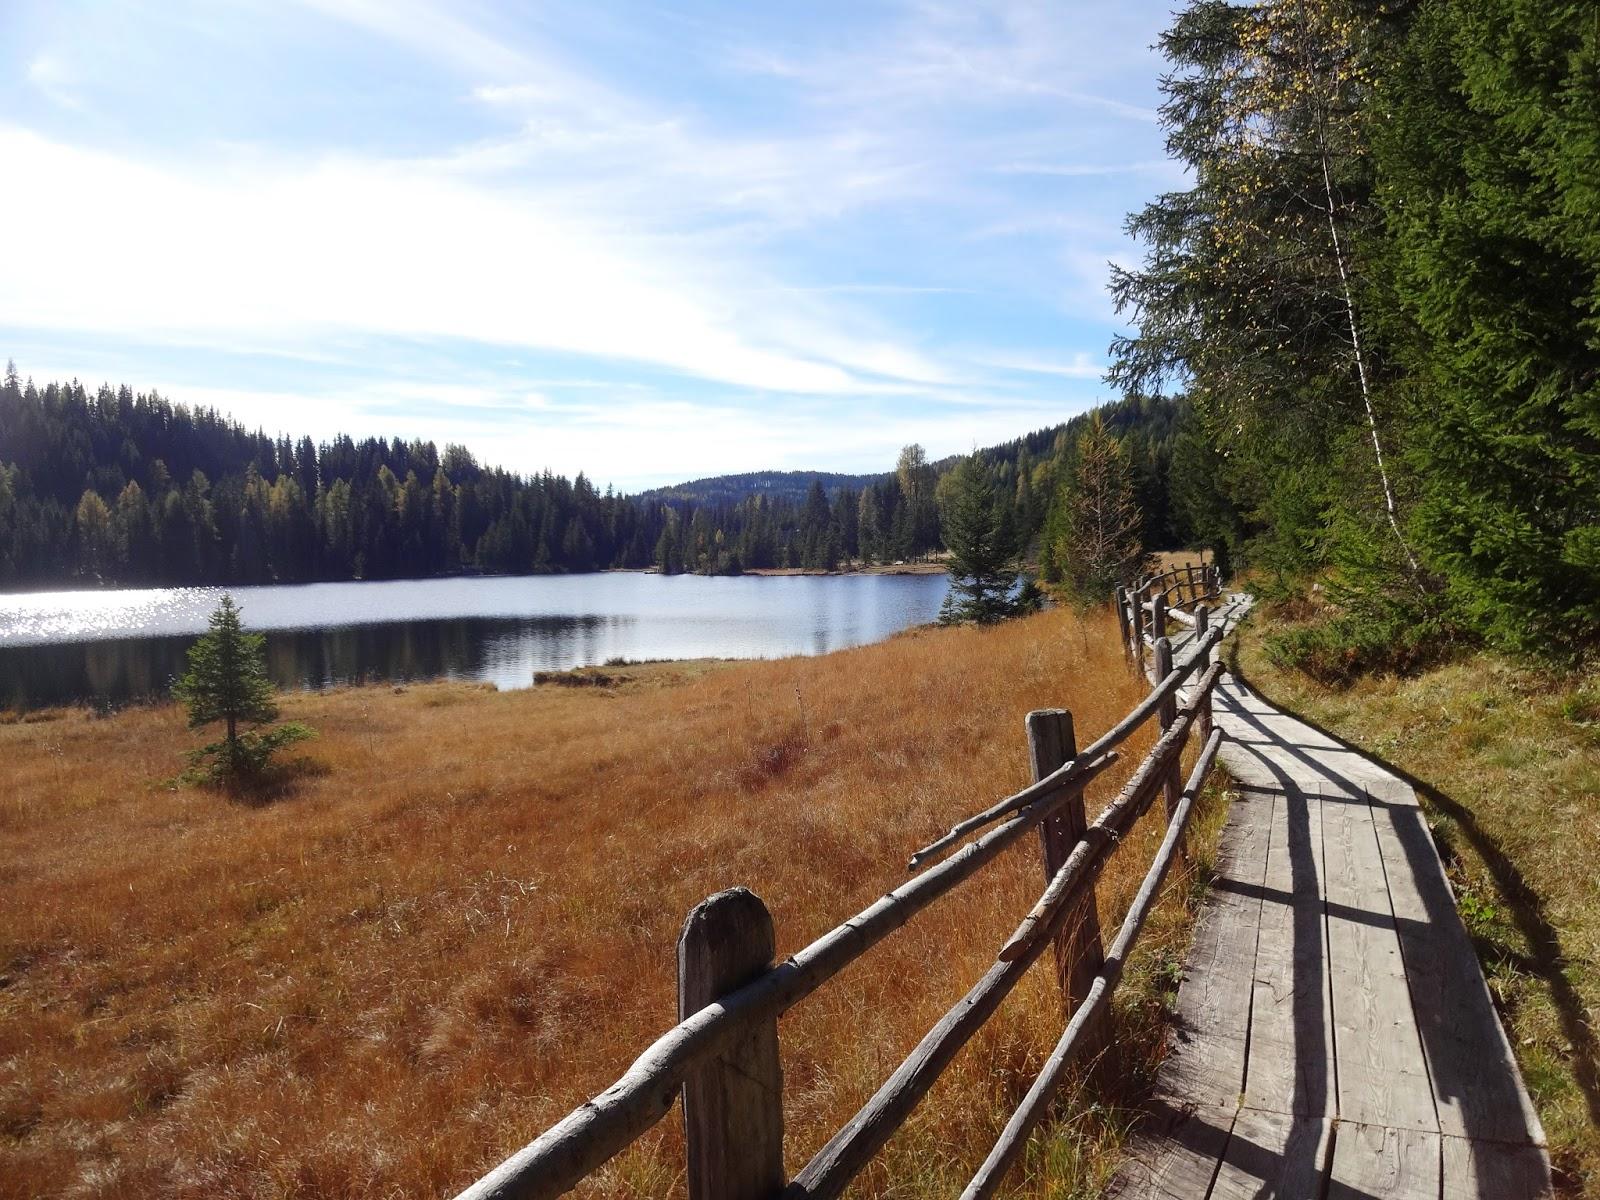 Pretty Clover Beautyblog, See, Herbststimmung, Bäume